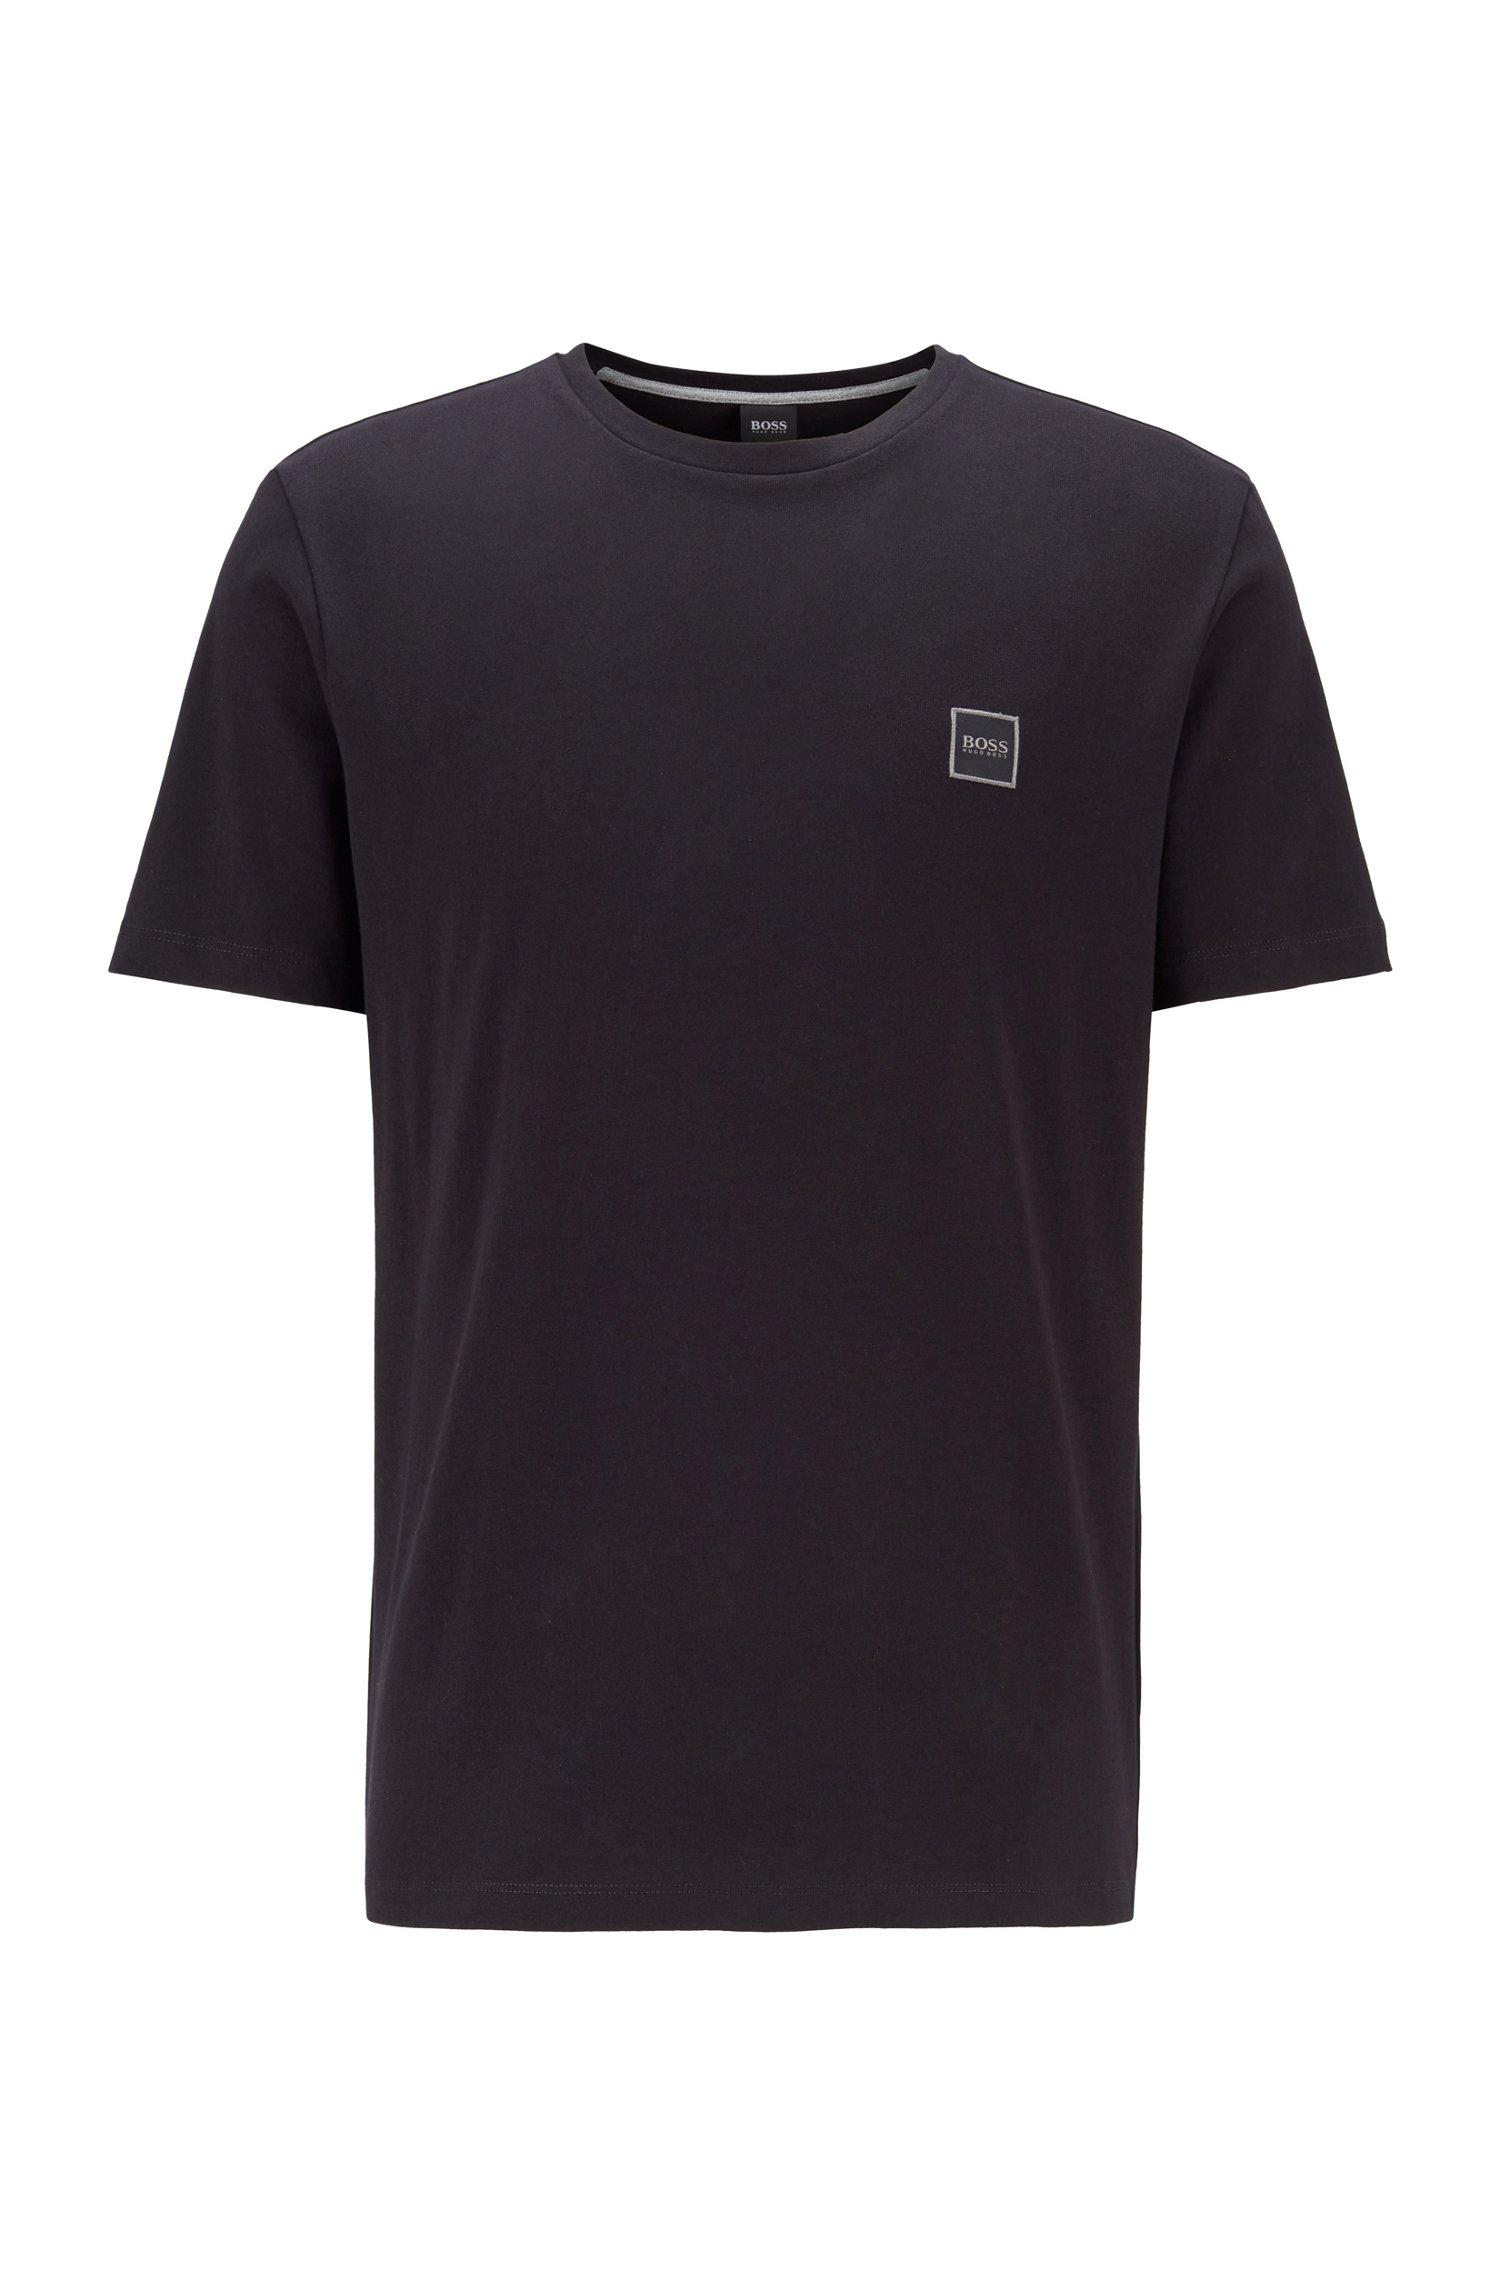 Crew-neck T-shirt in single-jersey cotton, Black